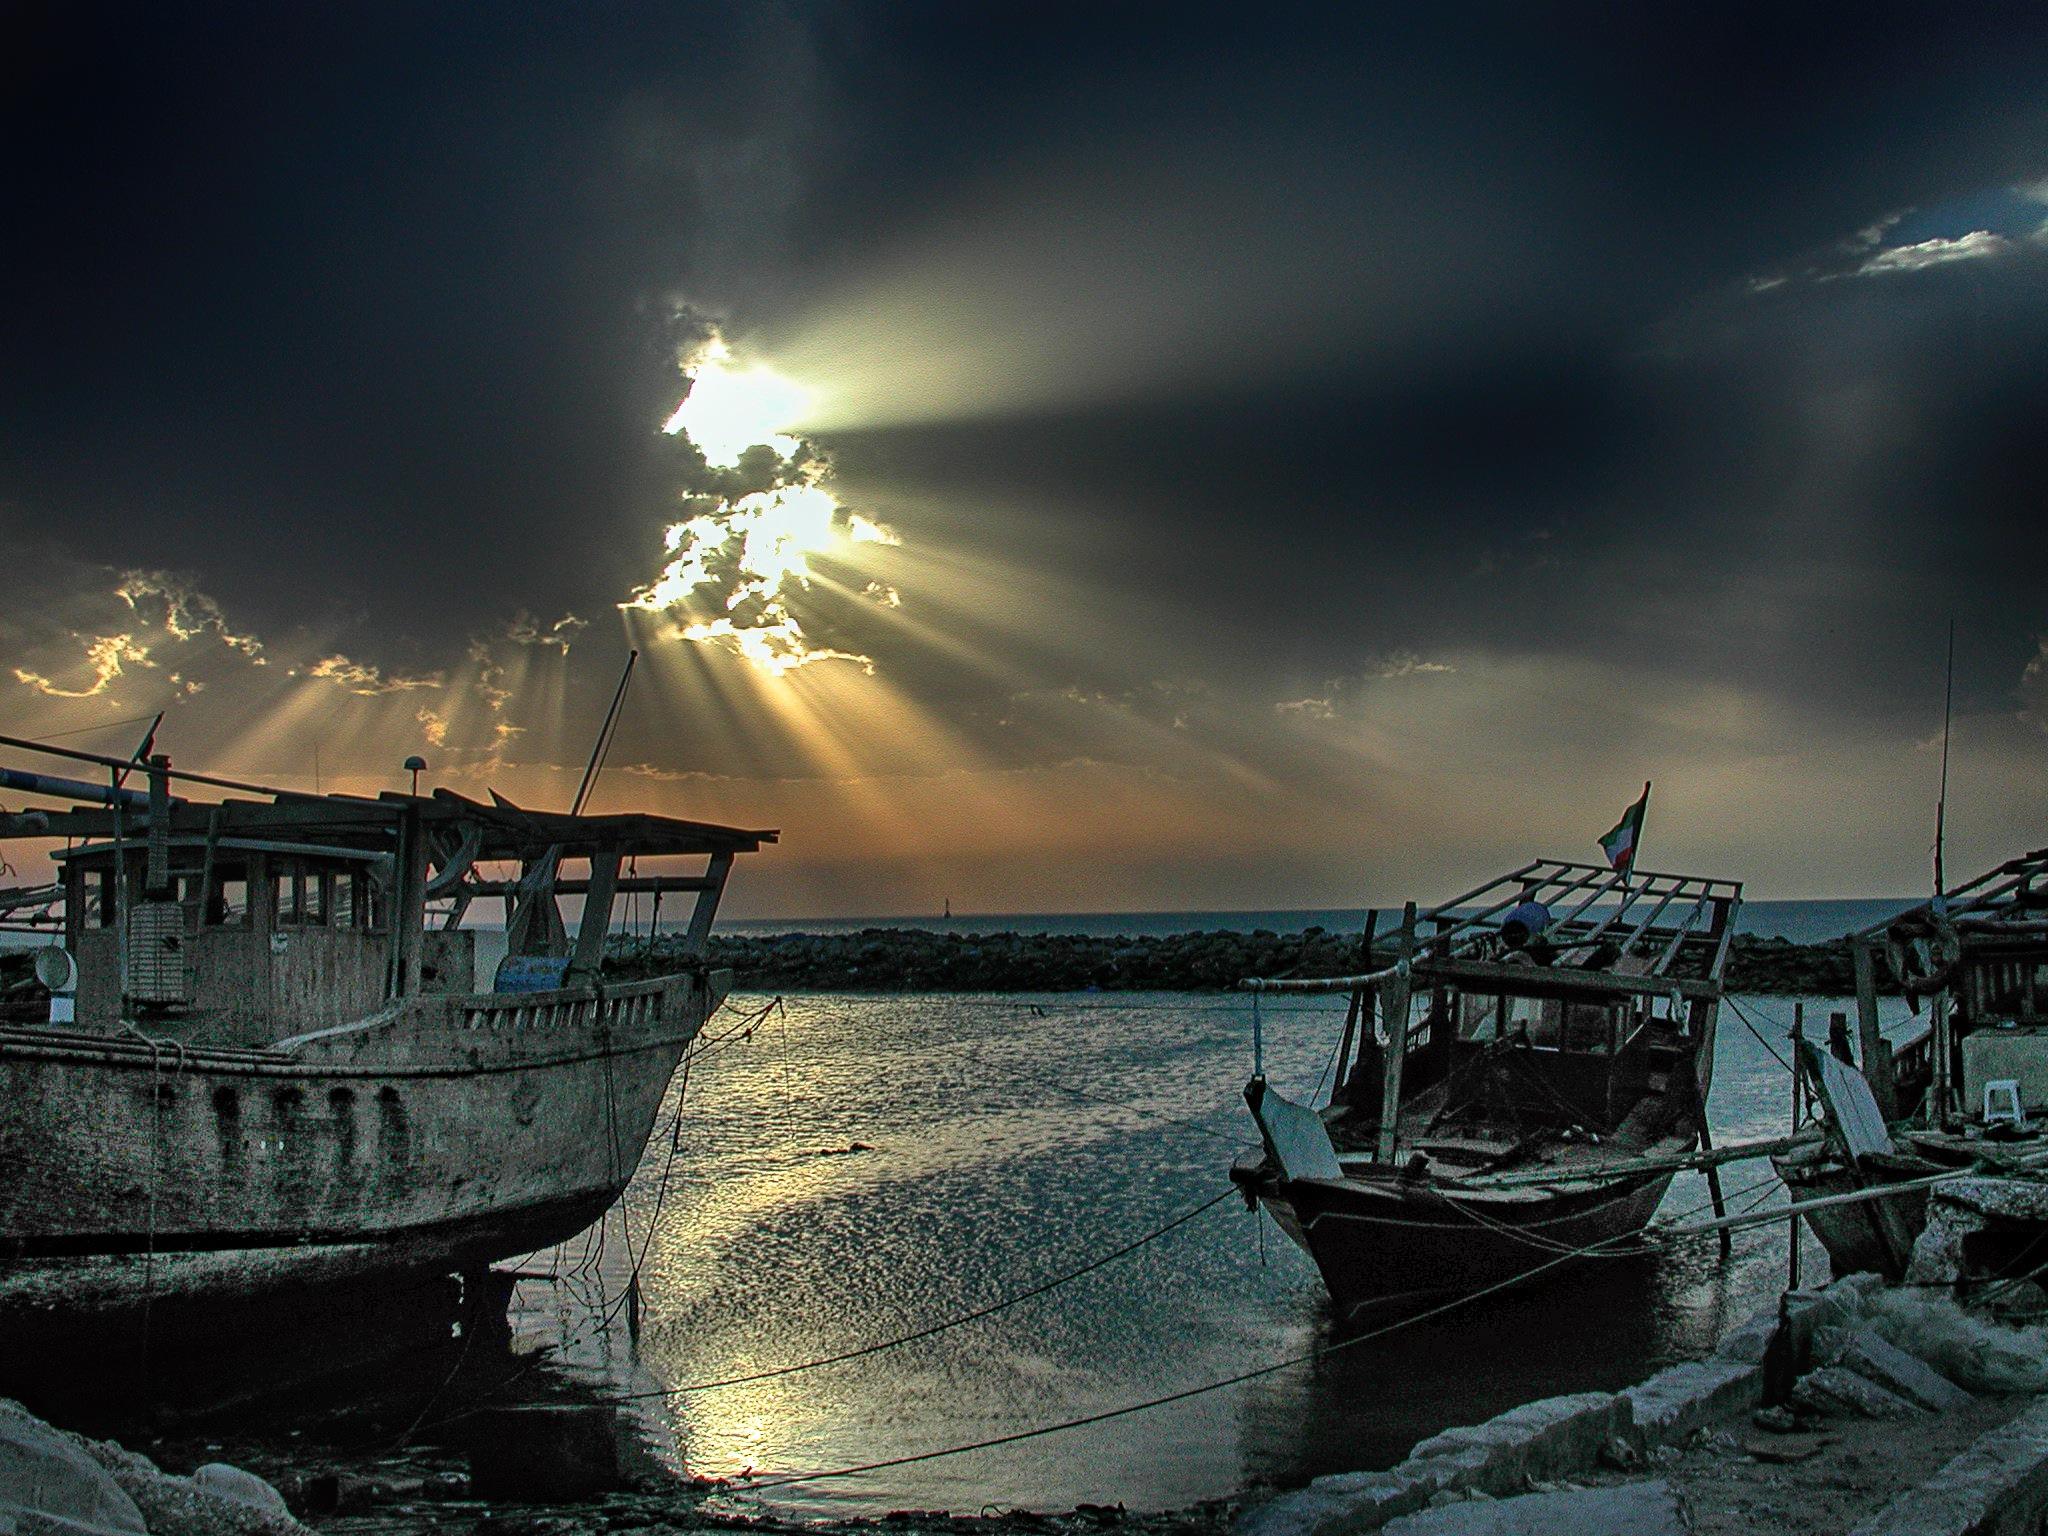 Escaping light by Hisham Badran